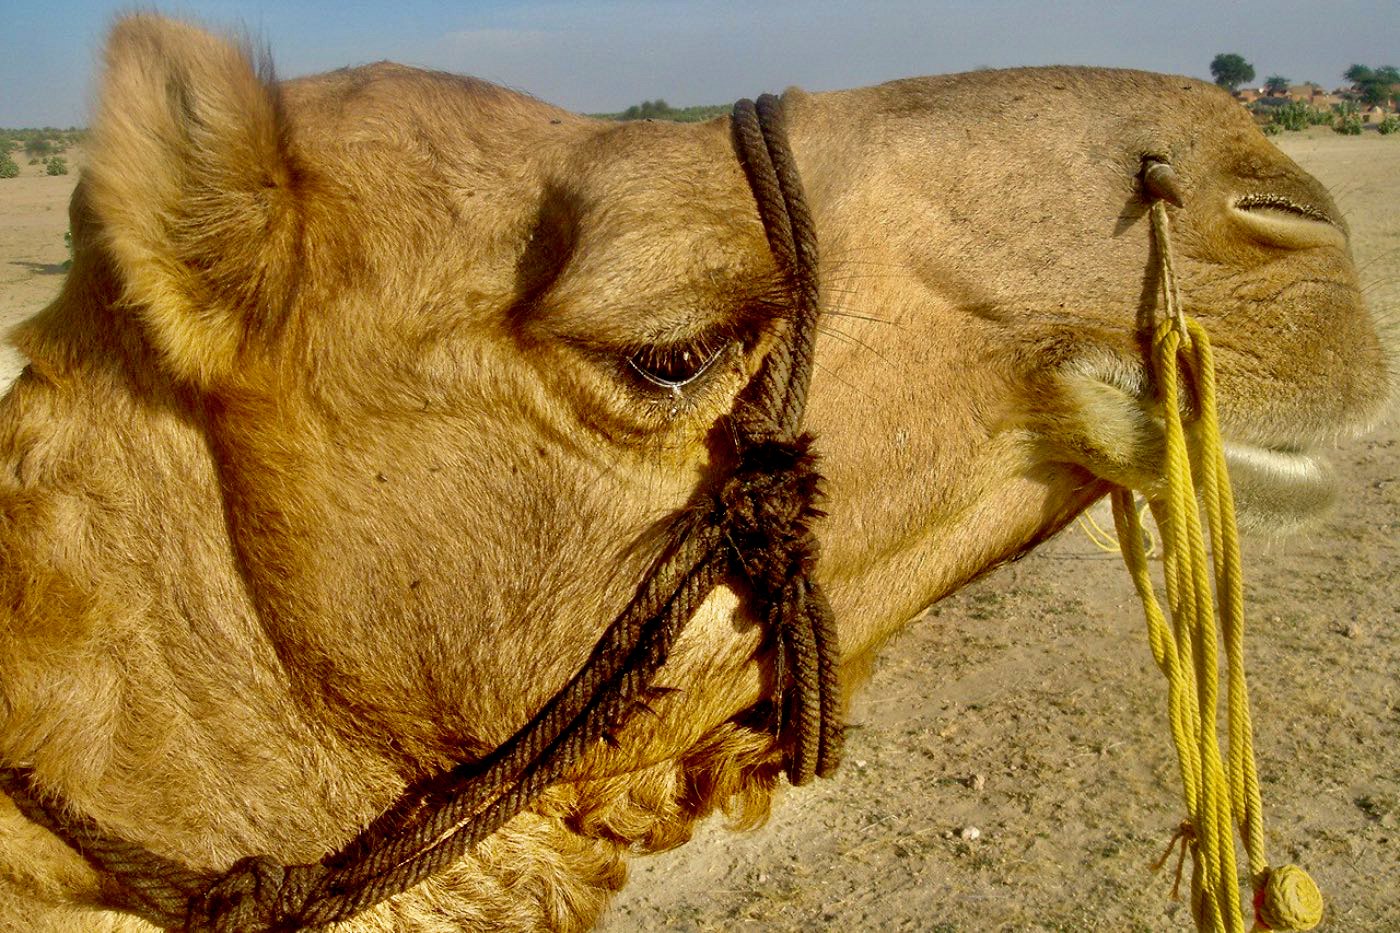 Camel Desert Camp in Jaisalmer Rajasthan India